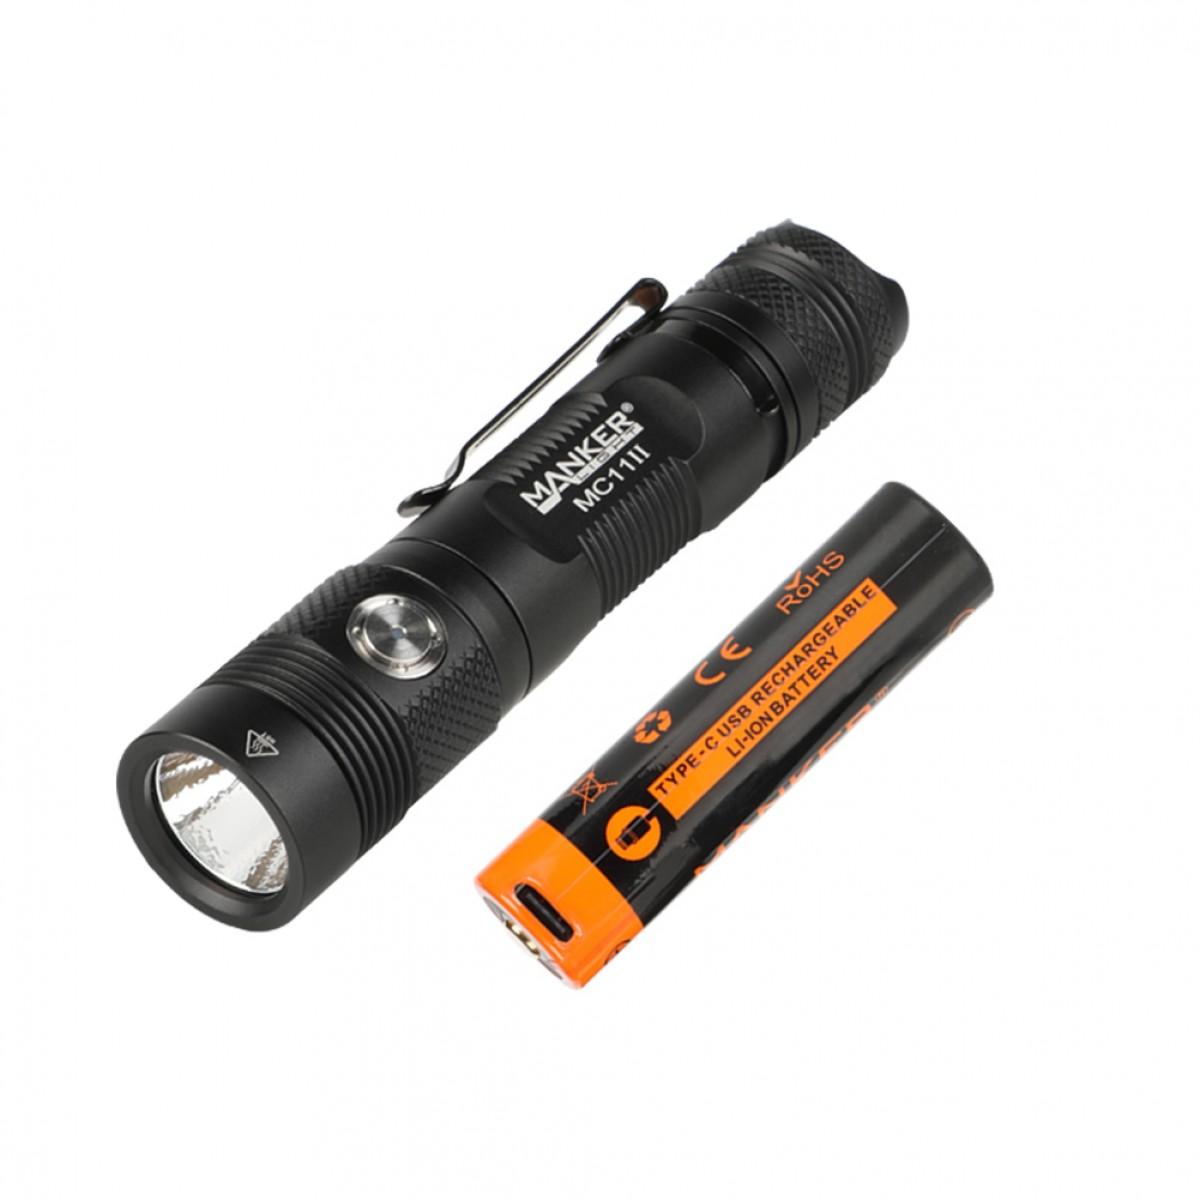 Manker MC11 II LUMINUS SST40 CW LED 2000L Rechargeable Flashlight